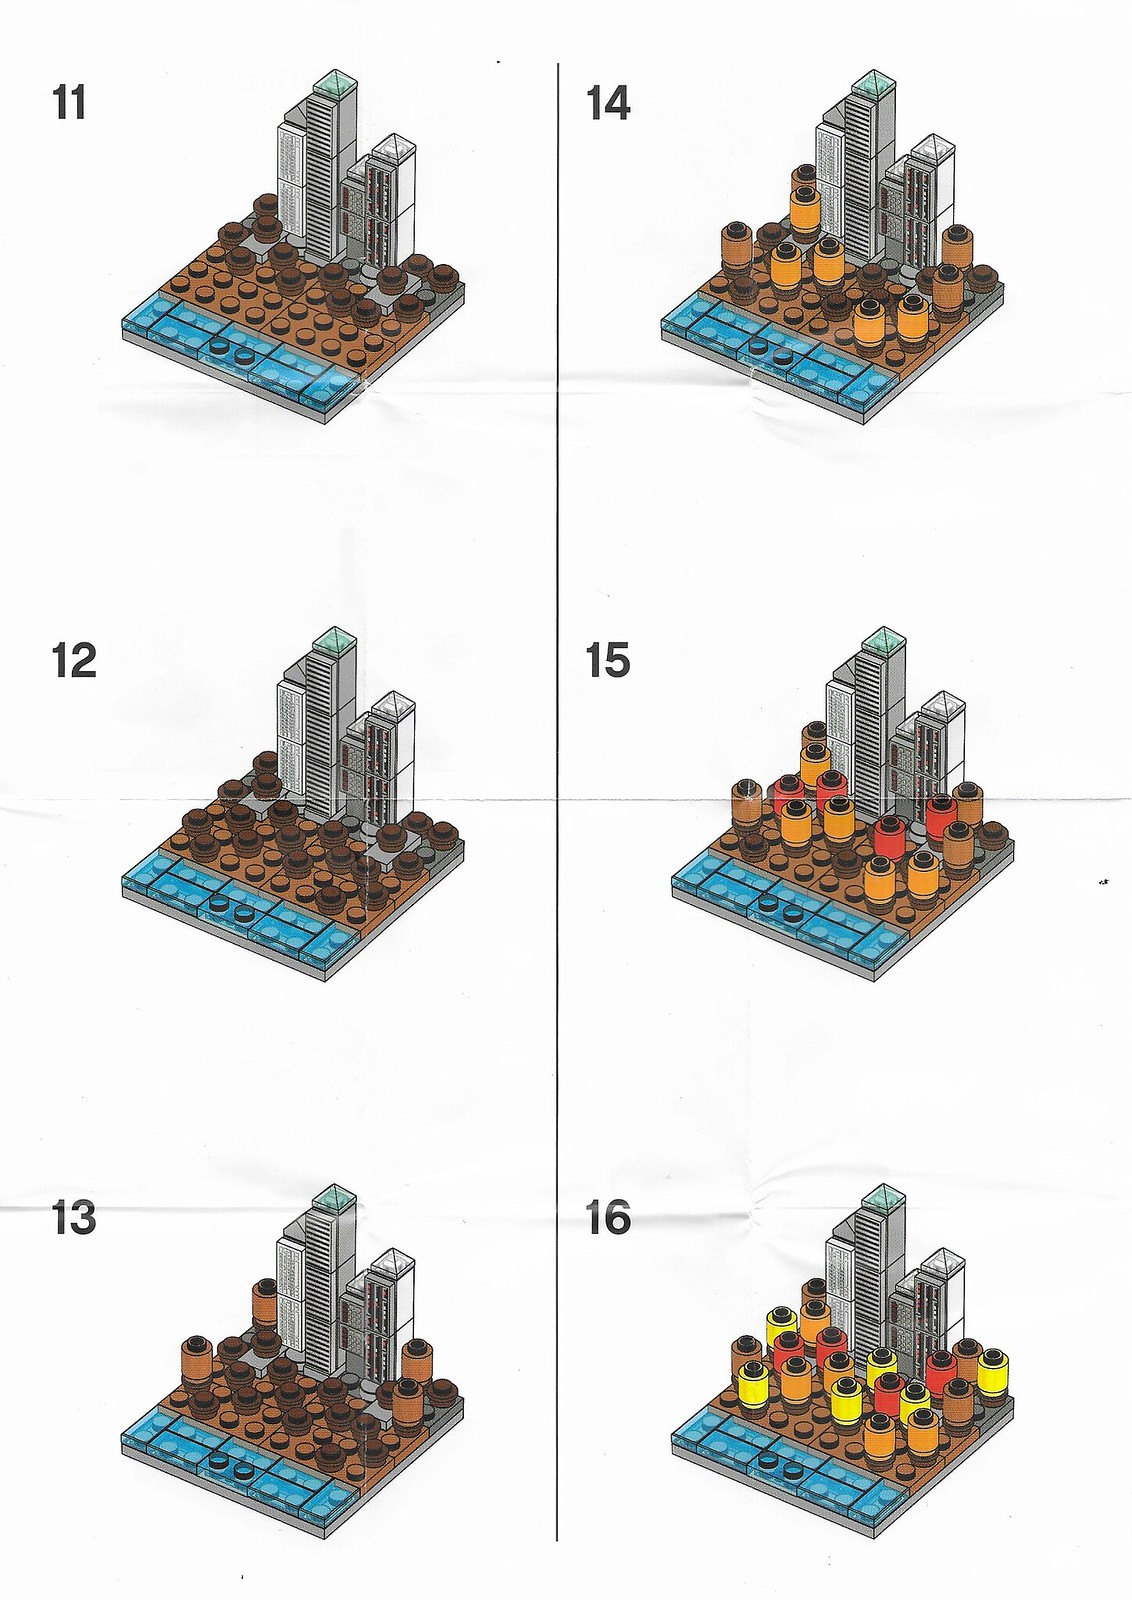 Toys 'R' Us LEGO Bricktober 2019 - Autumn